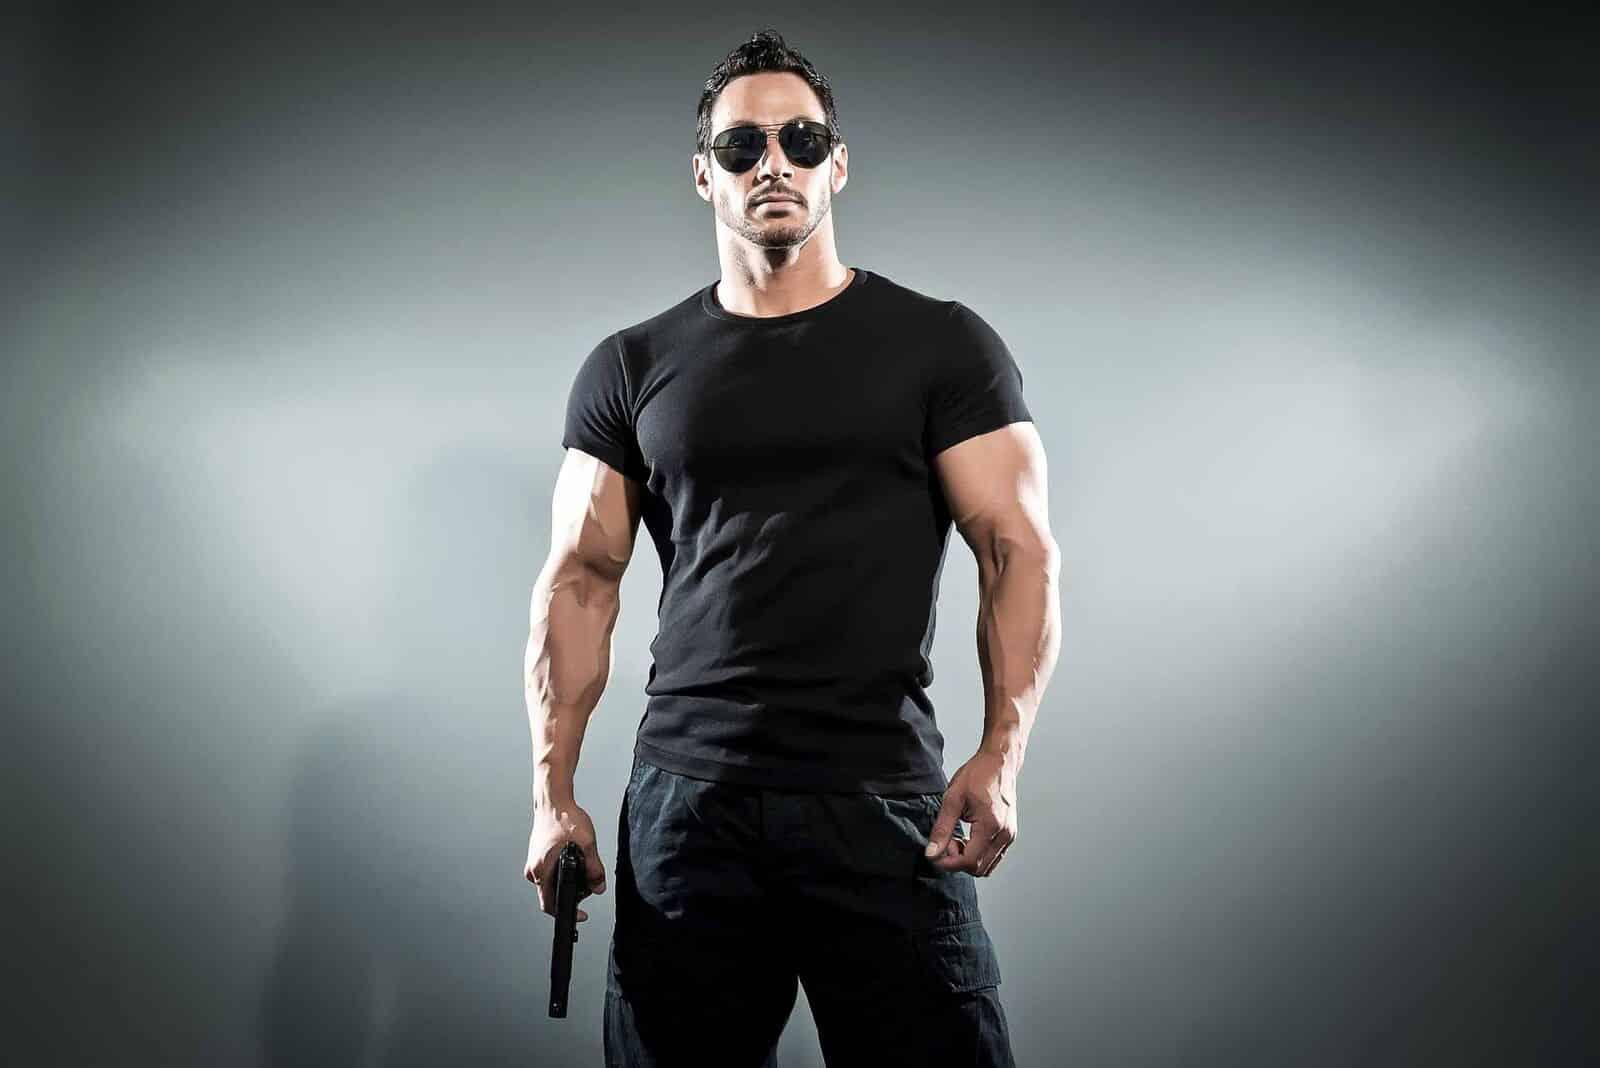 free testosterone test man holding a gun